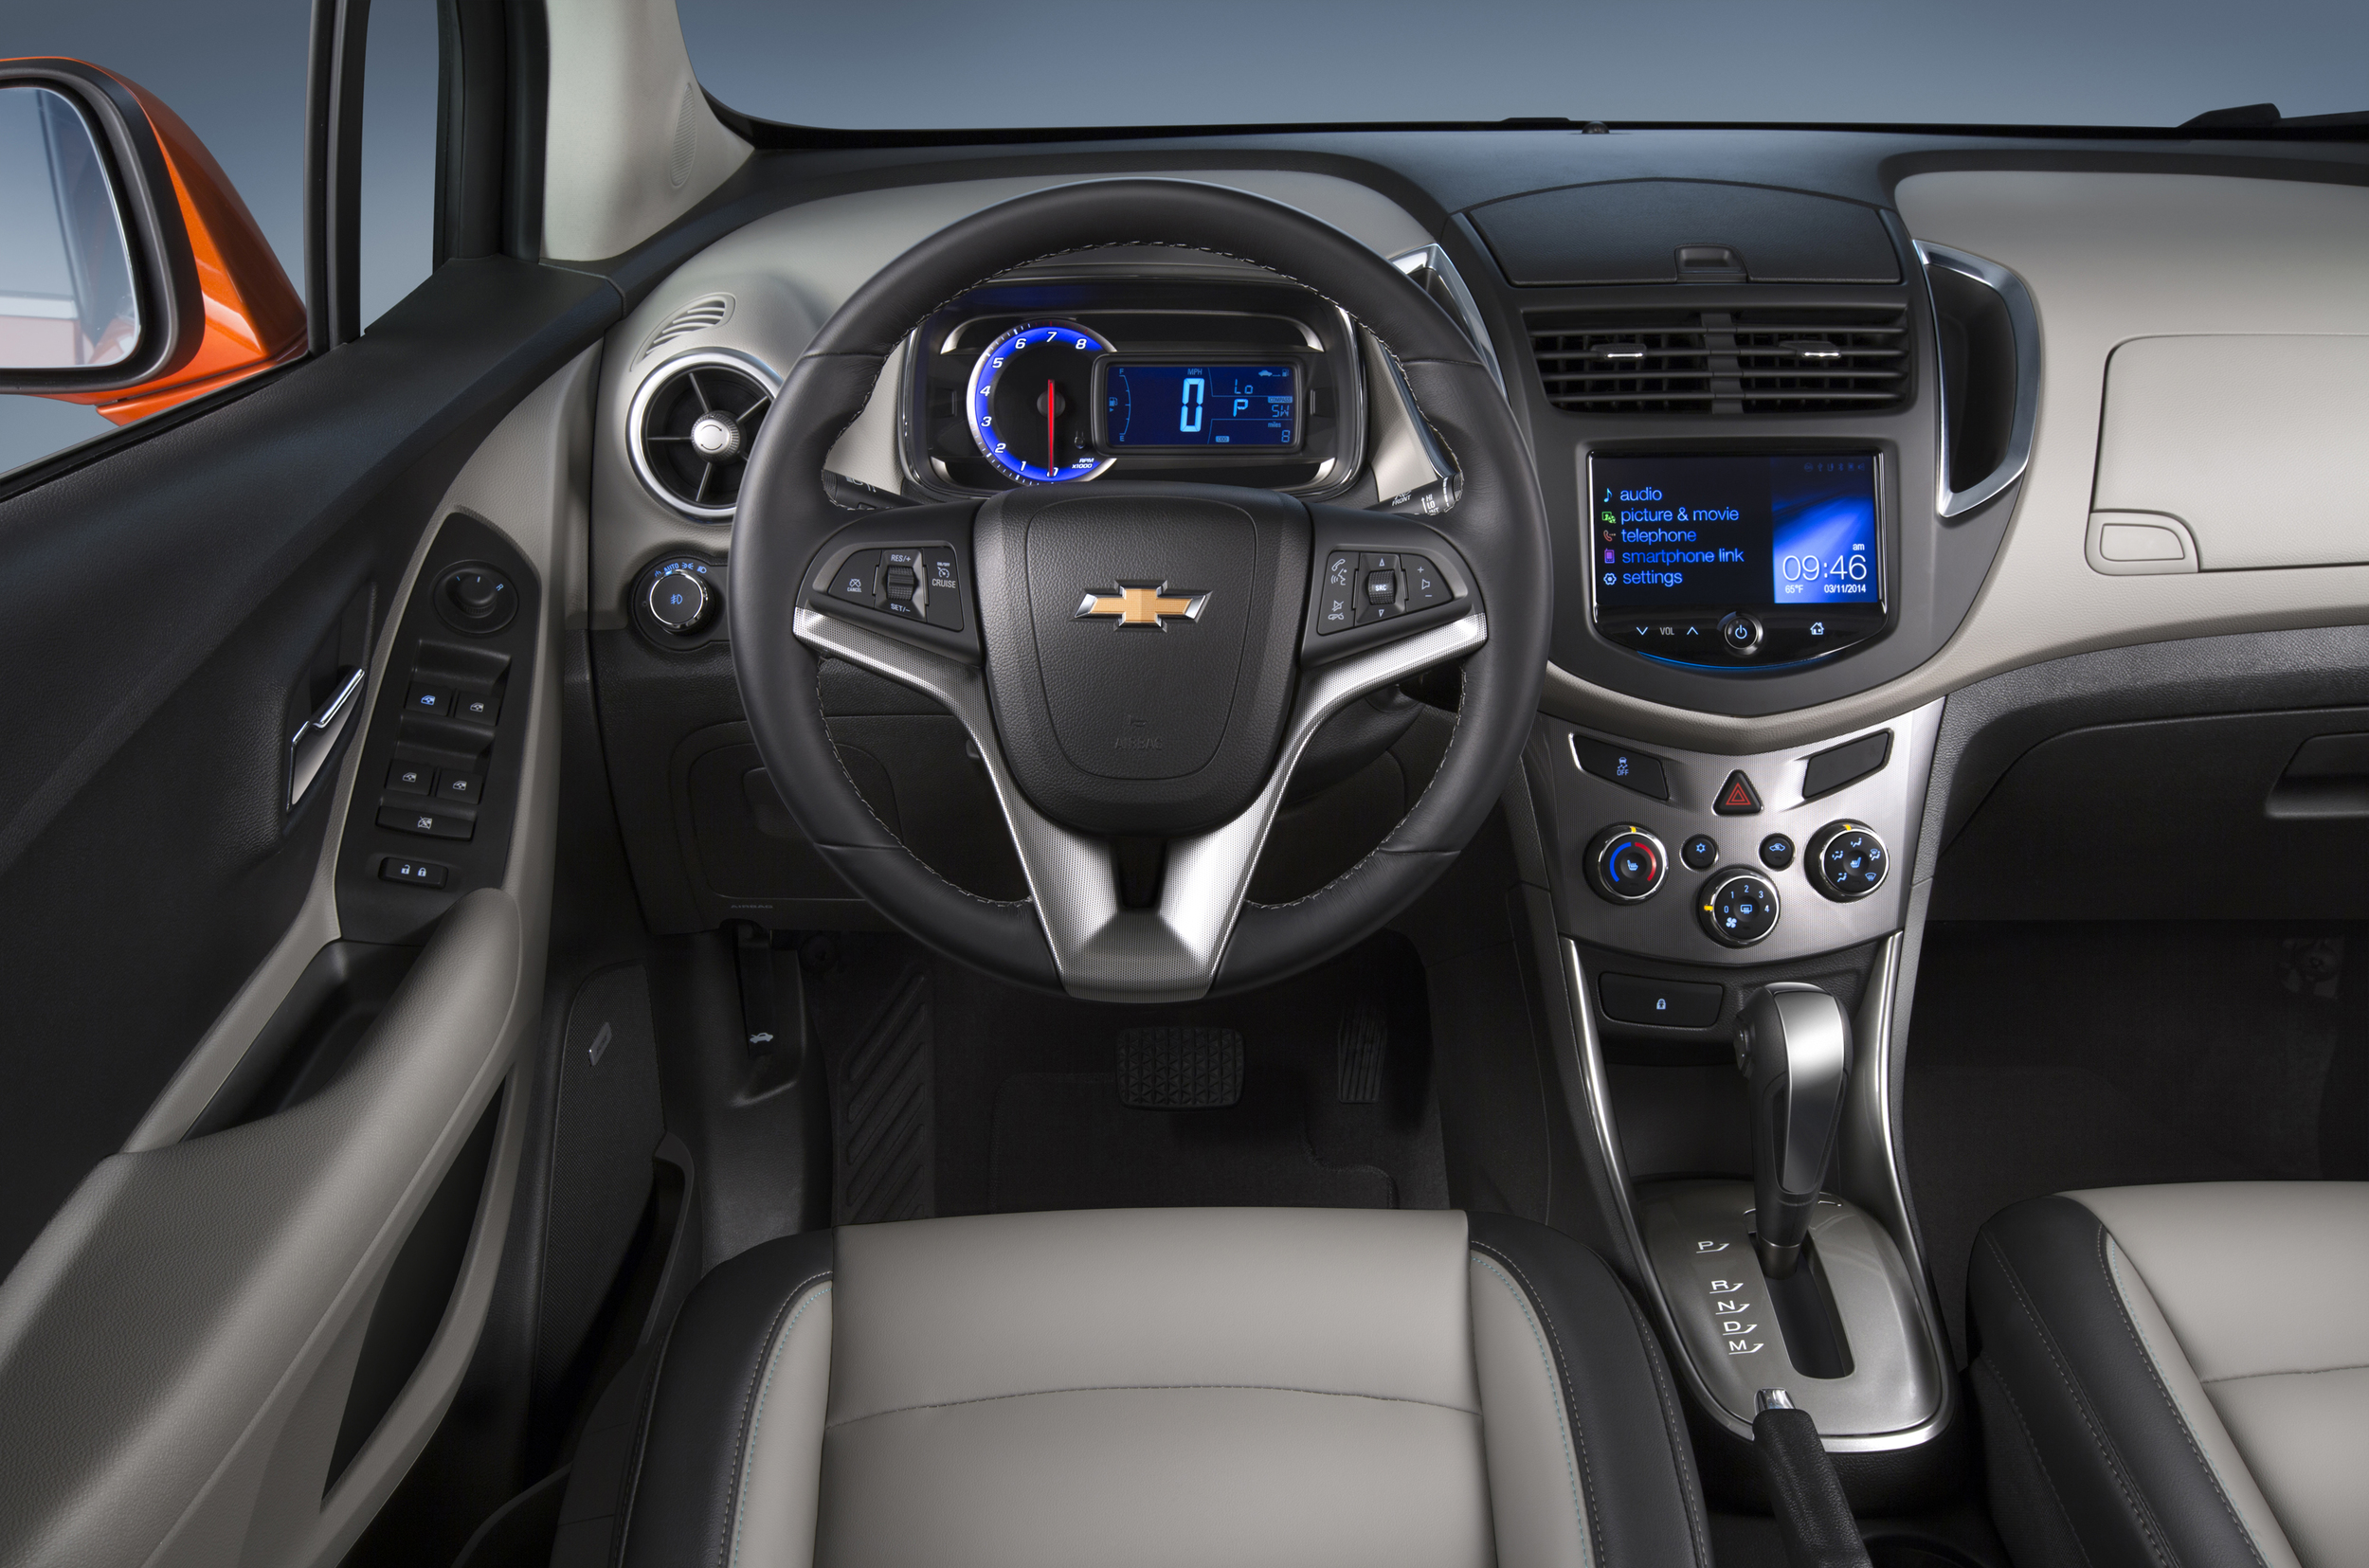 2016-Chevrolet-Trax-006.jpg